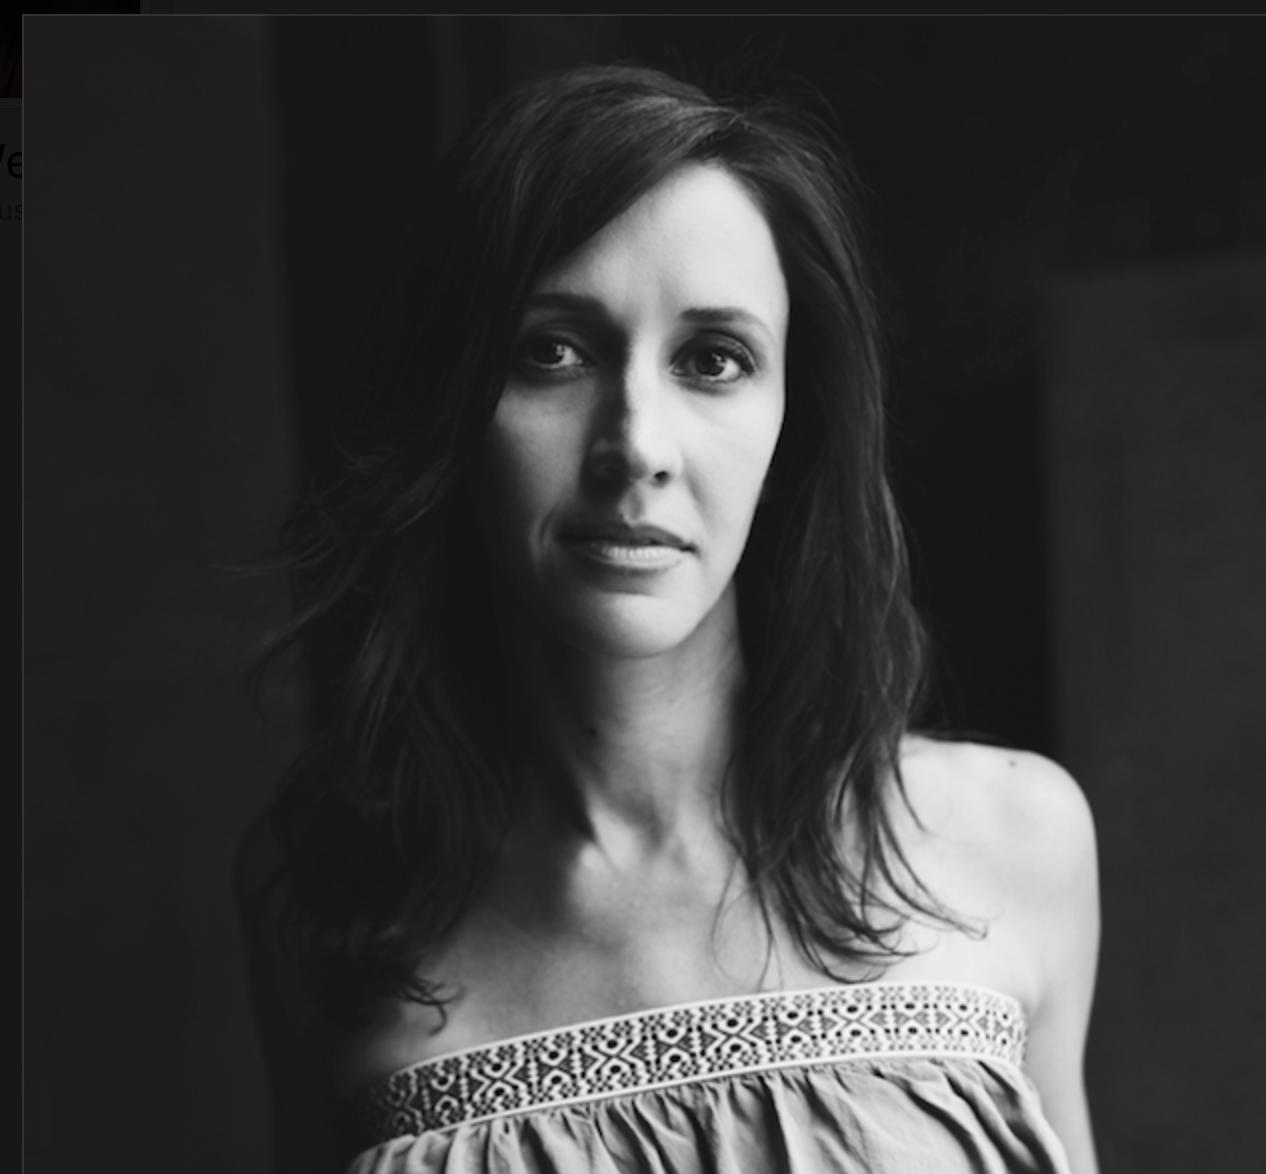 Christa Wells (2014, 2018, 2019, 2020)